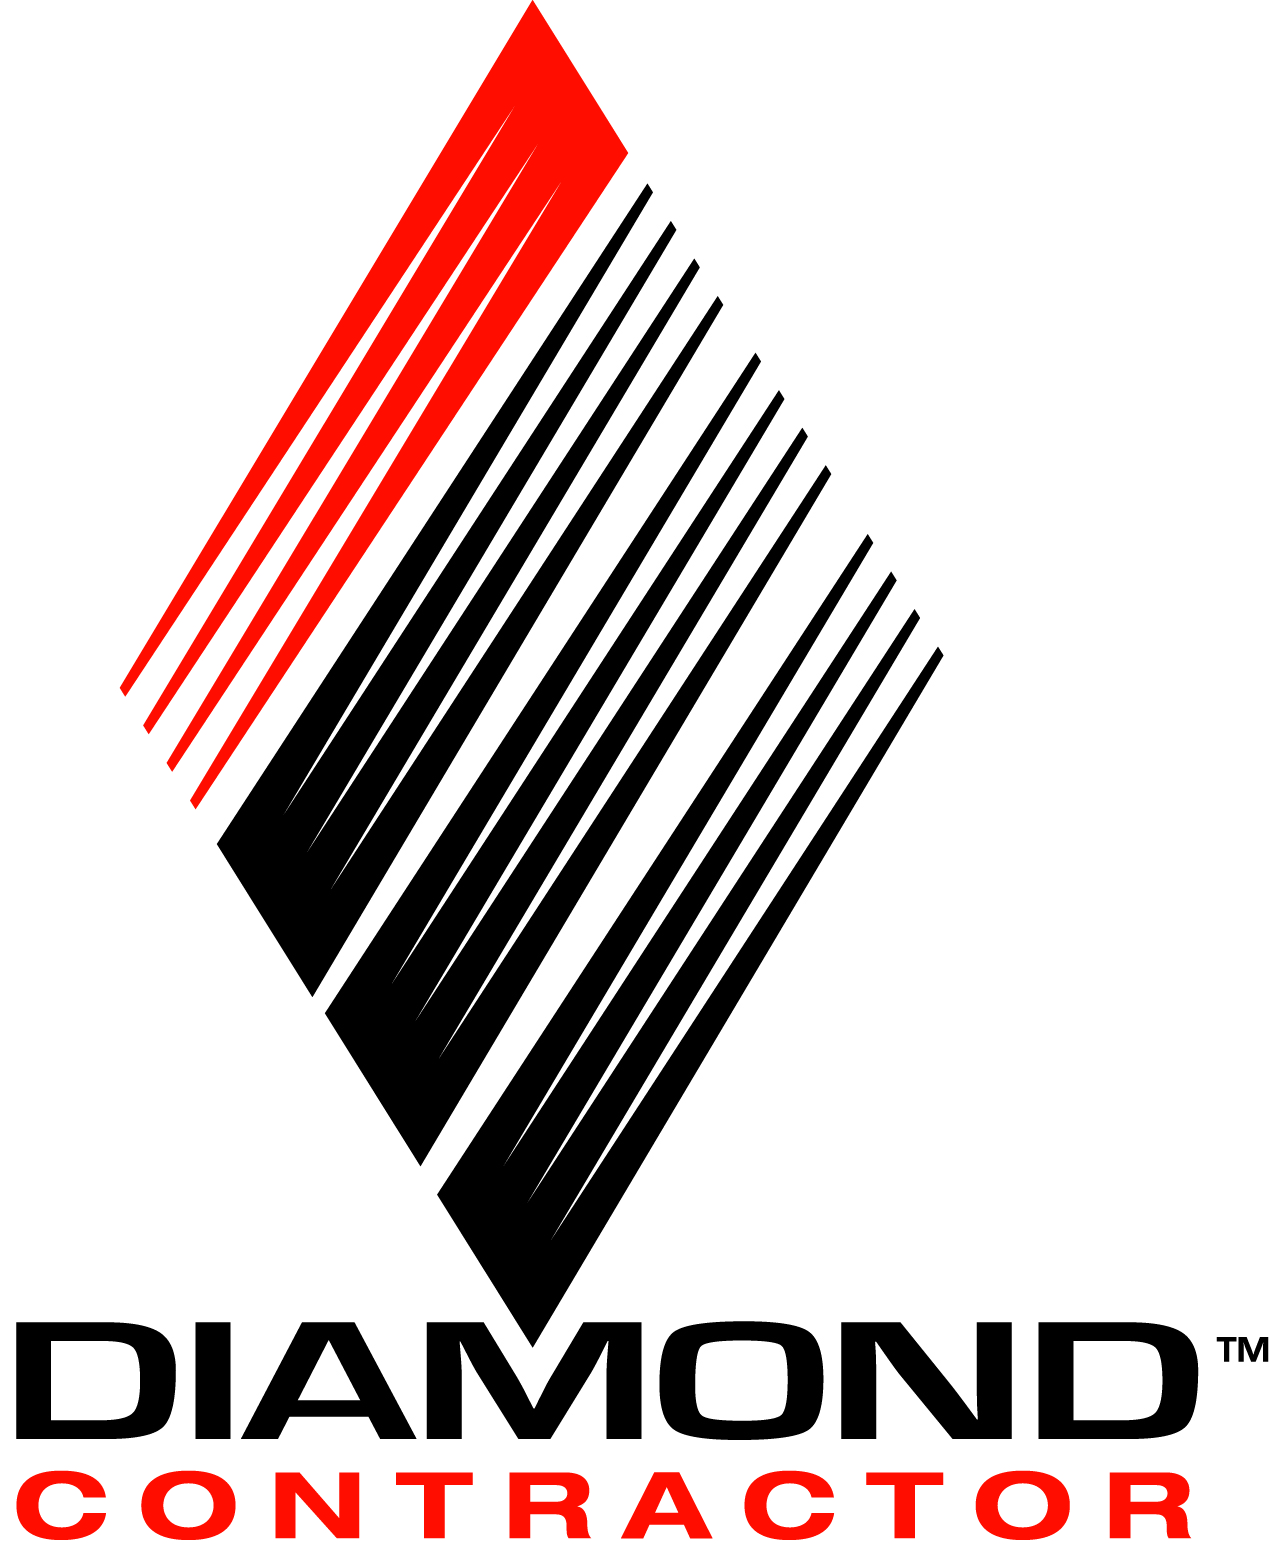 Diamond Contractor.jpg